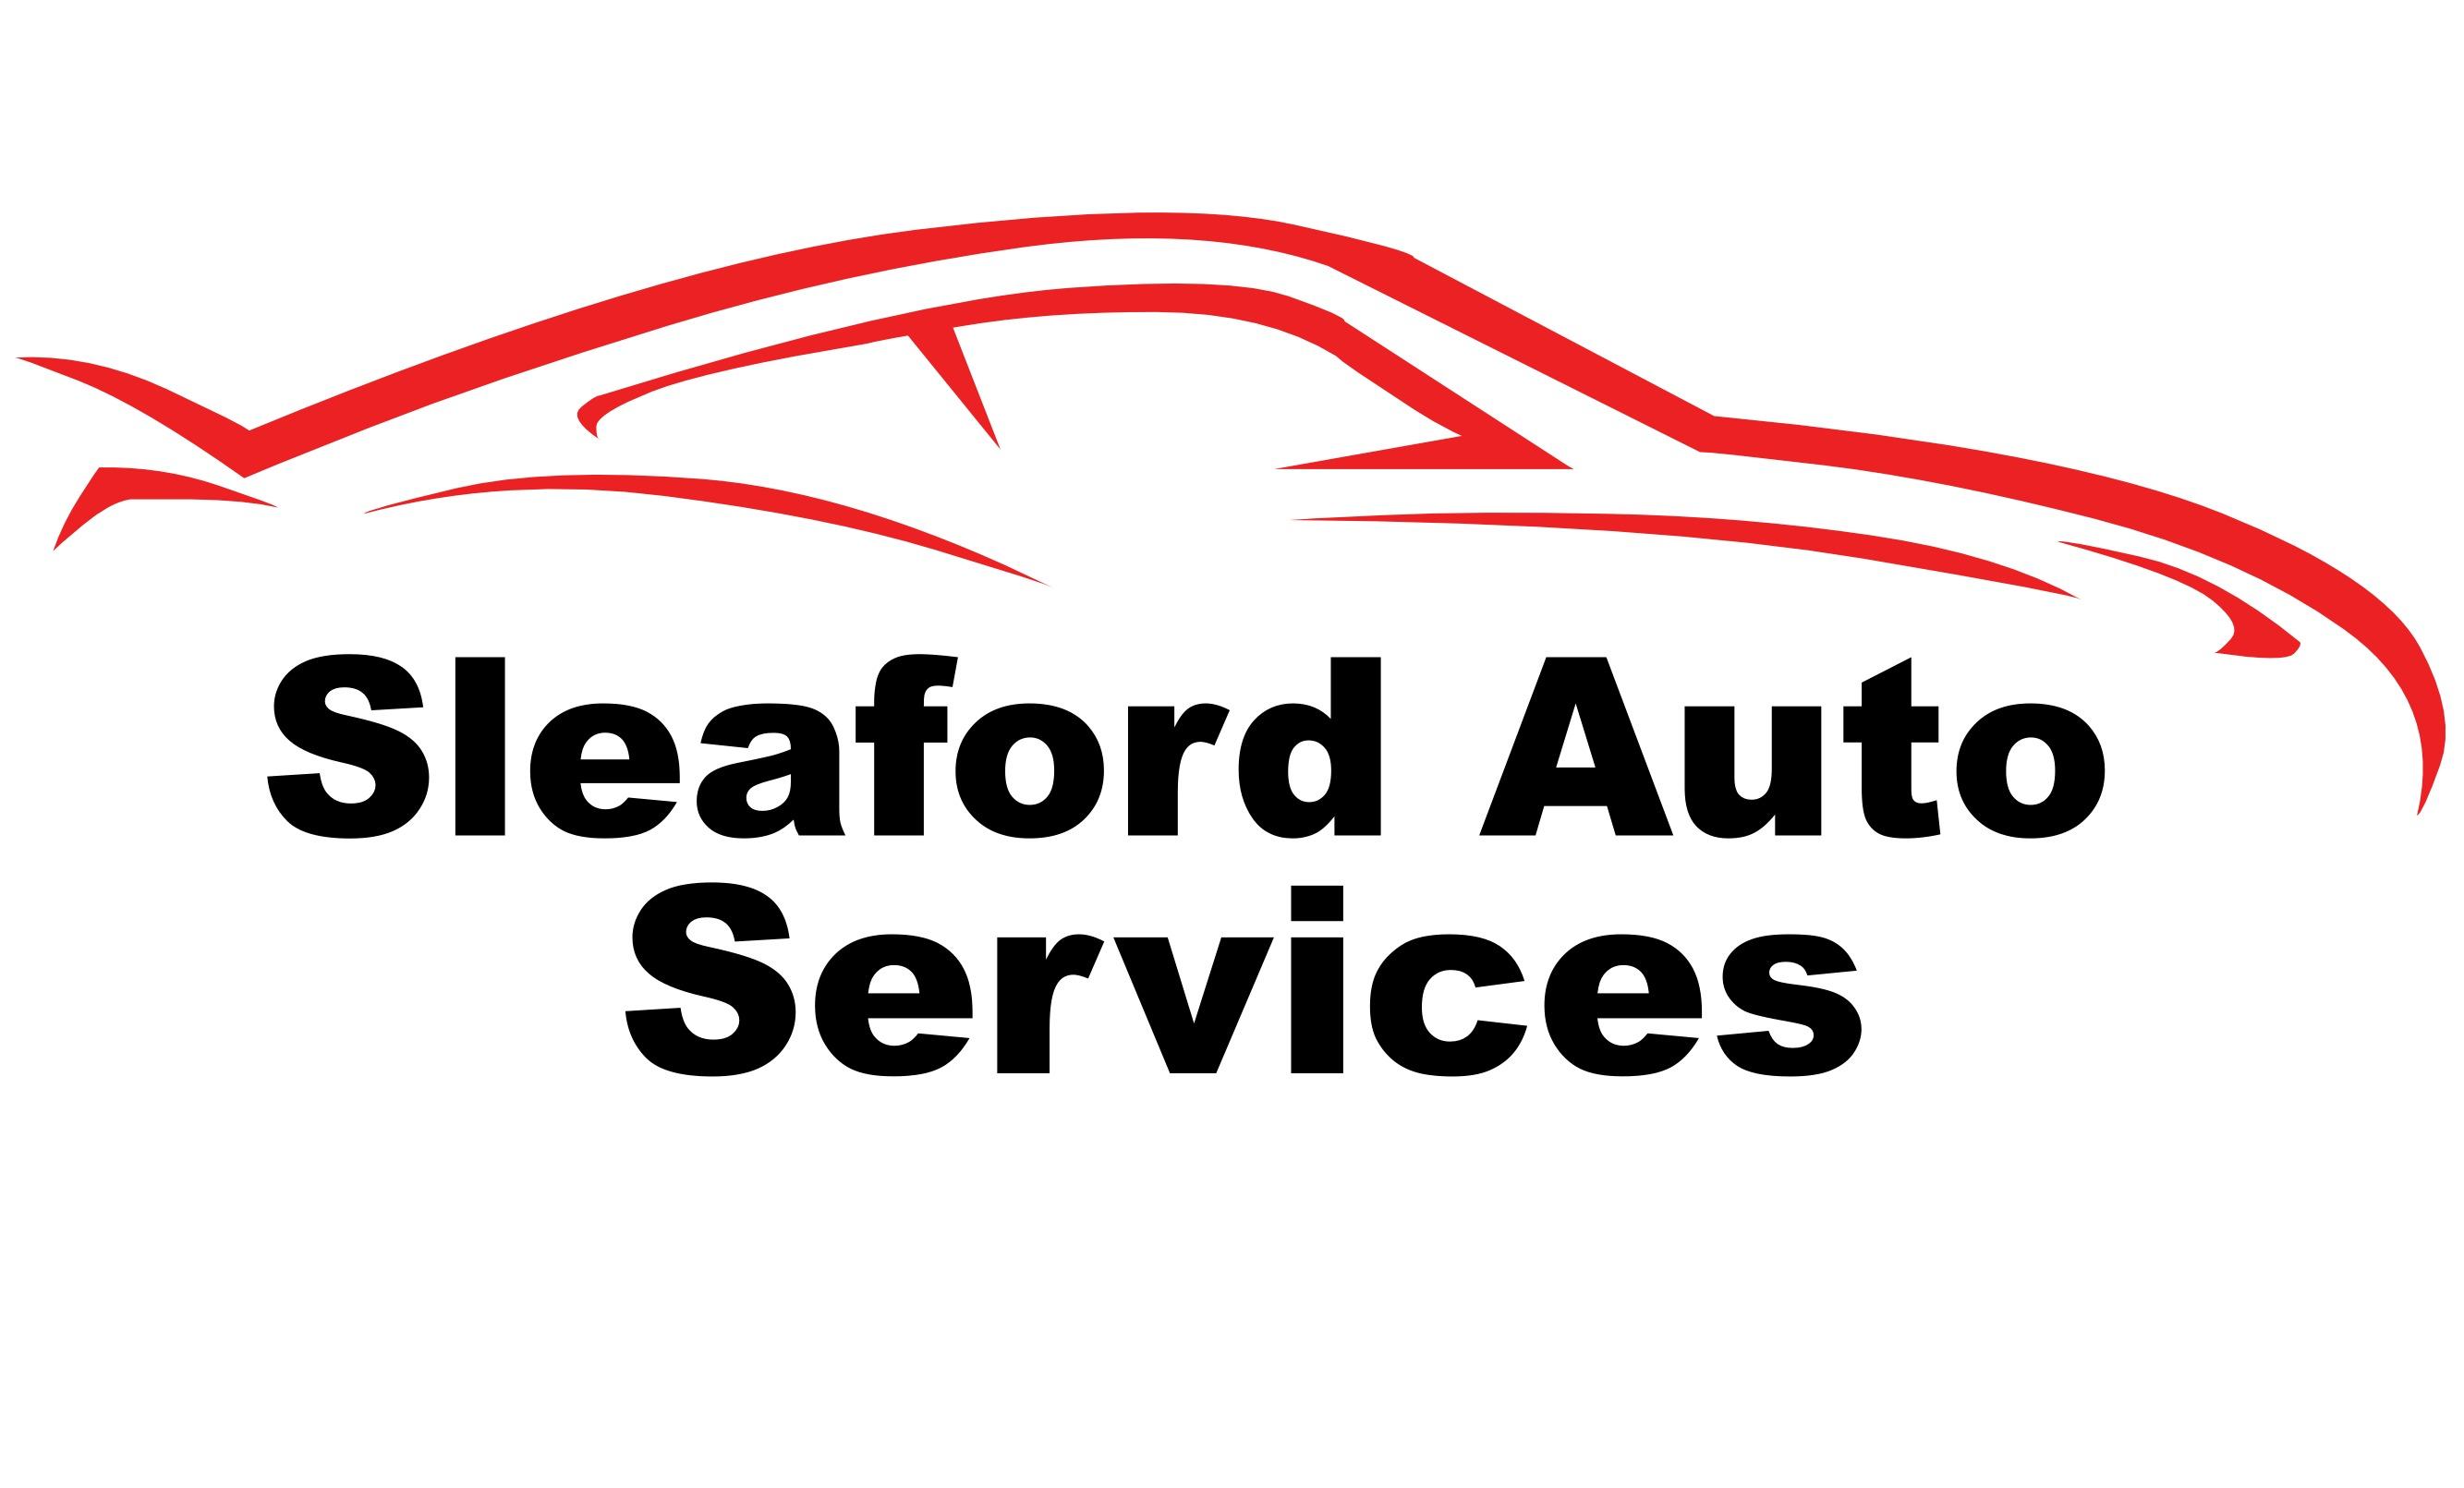 Sleaford Auto Services Ltd